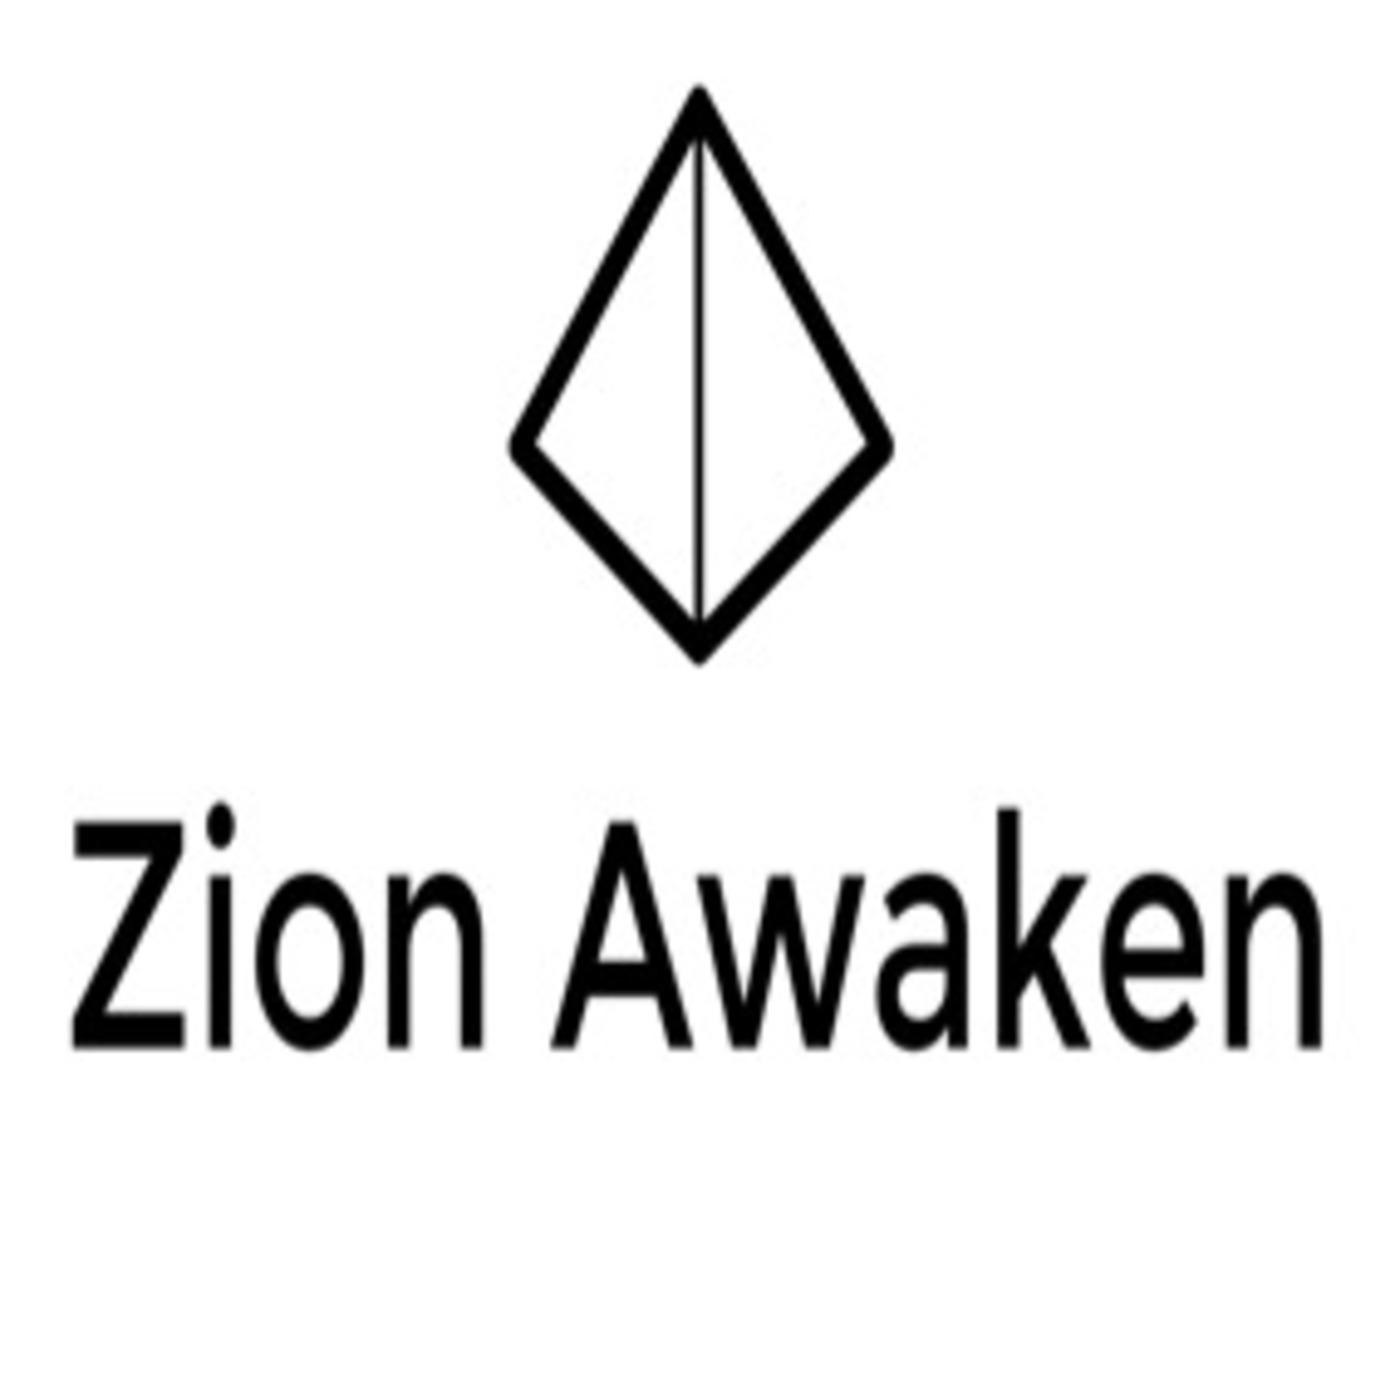 Zion Awaken